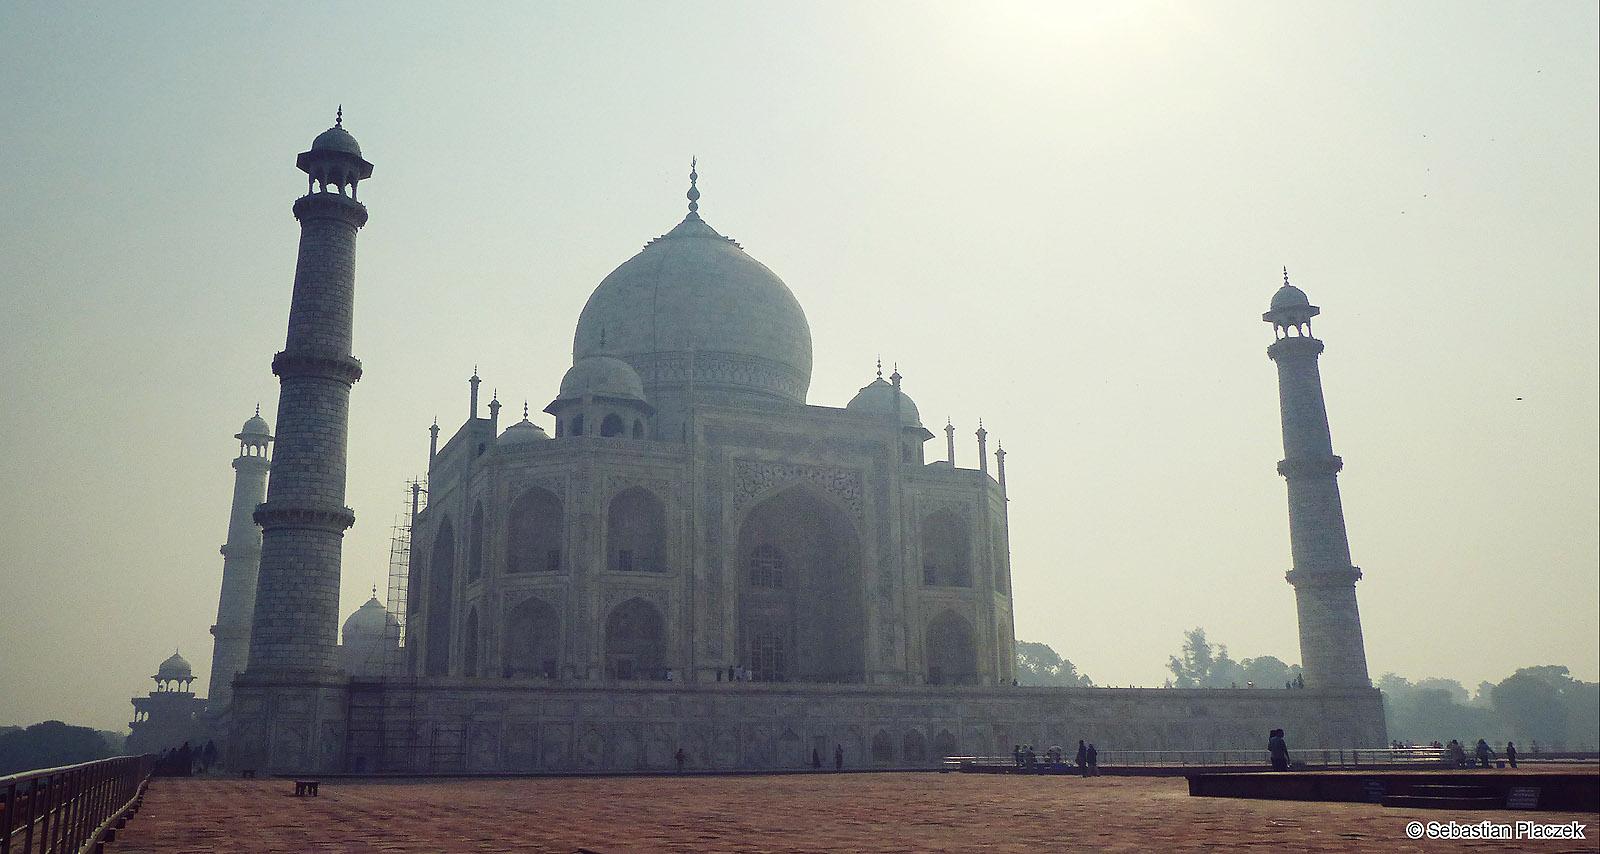 Zdjęcia z Indii - Taj Mahal. Foto - Sebastian Placzek